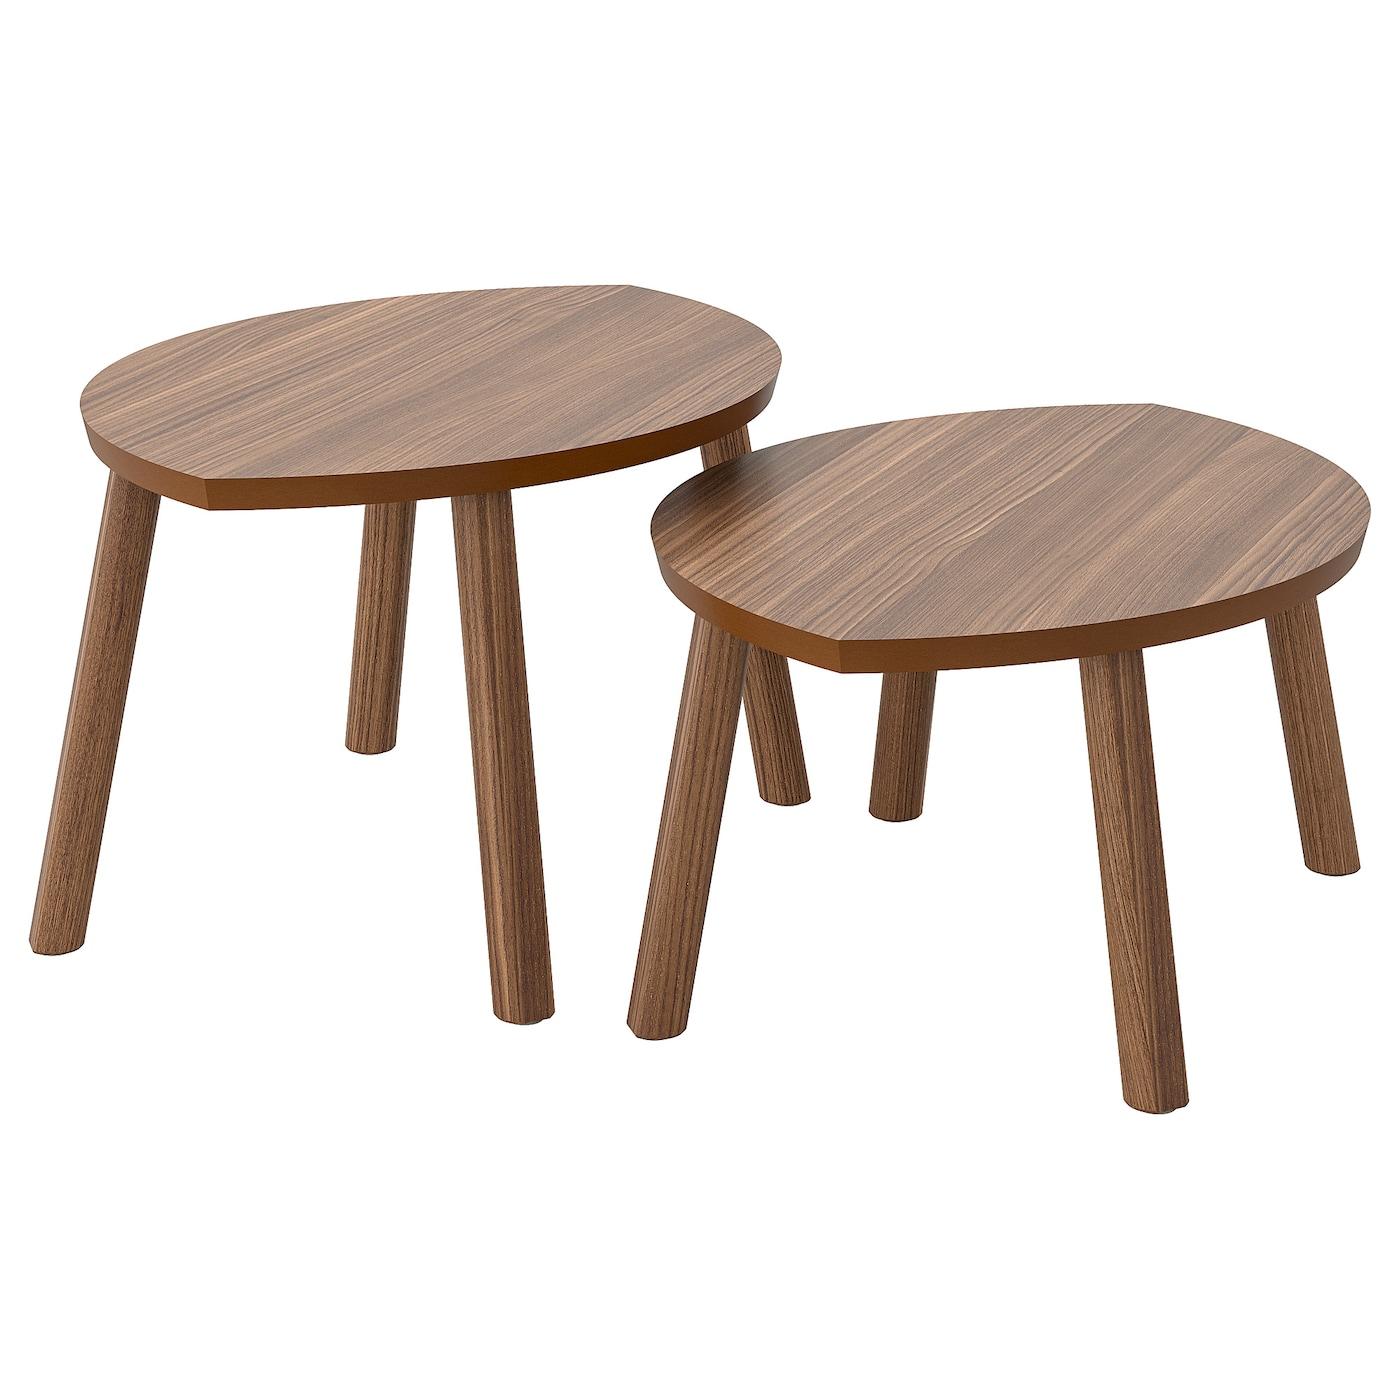 Stockholm Walnut Veneer Nest Of Tables Set Of 2 Ikea [ 1400 x 1400 Pixel ]